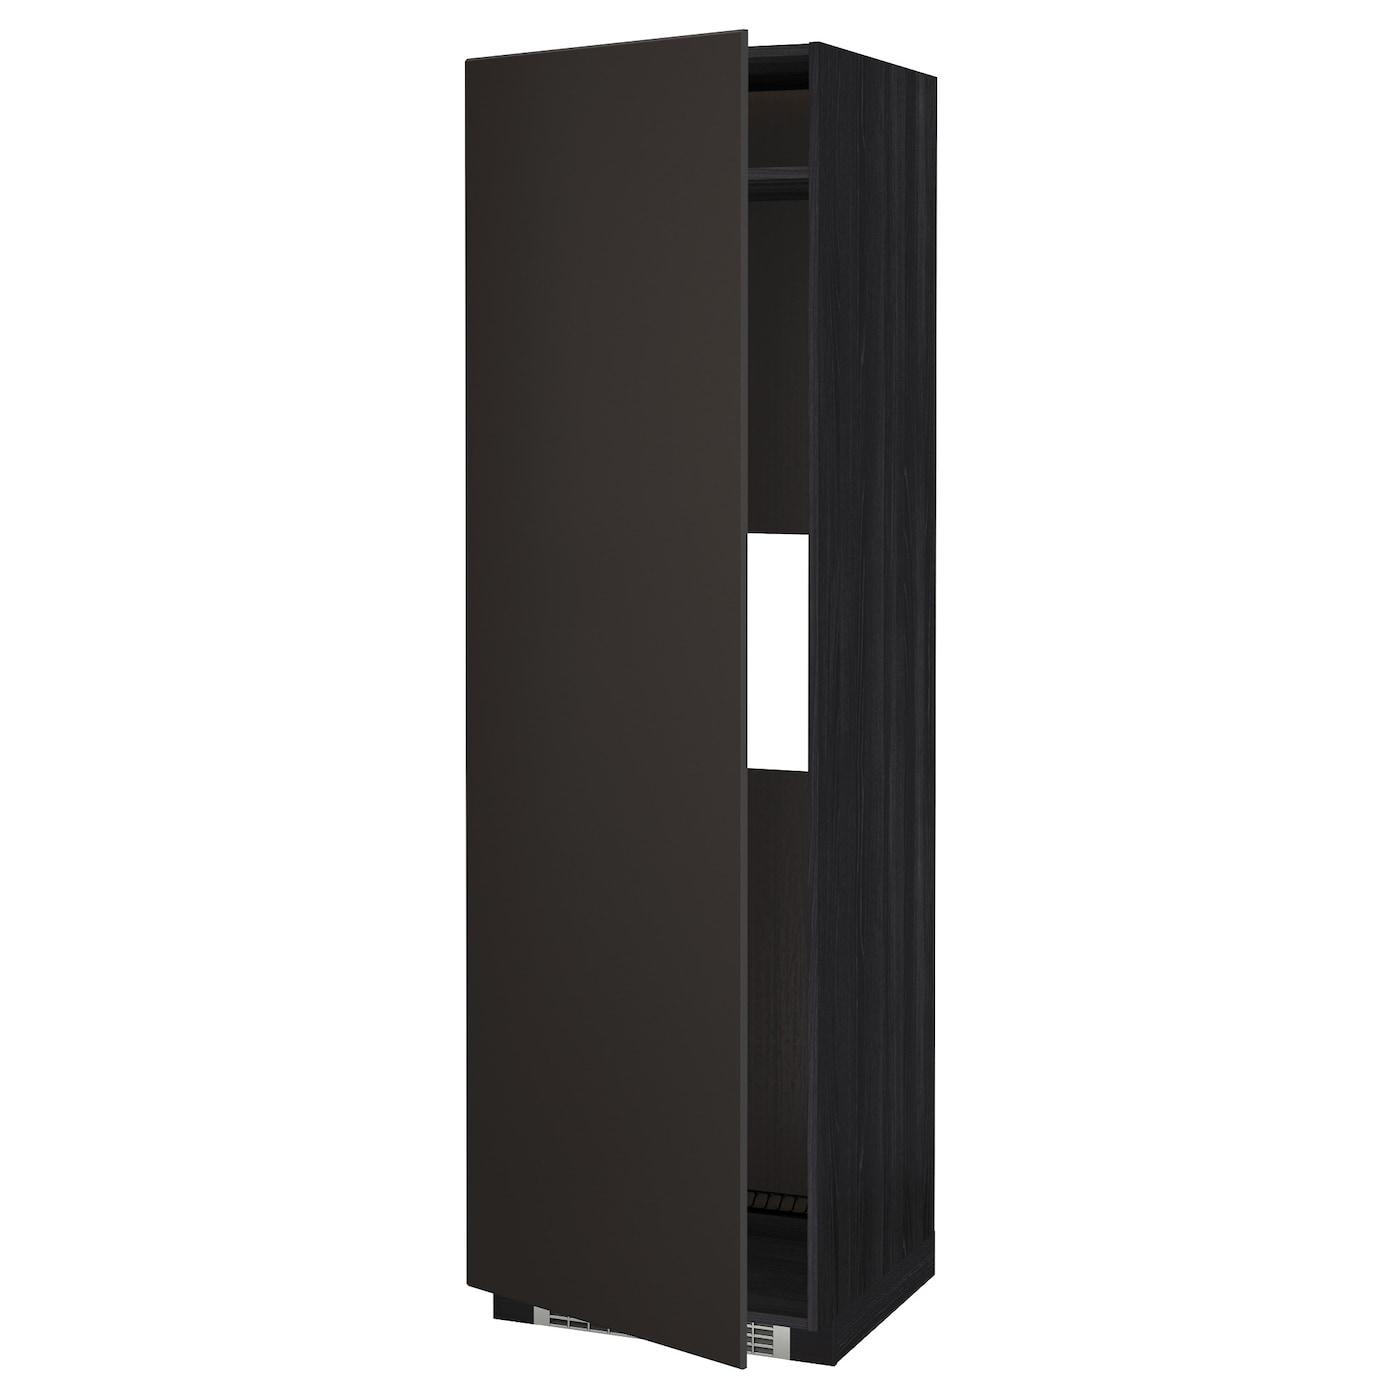 Ikea K Che Metod metod high cab f fridge or freezer w door black kungsbacka anthracite 60x60x200 cm ikea